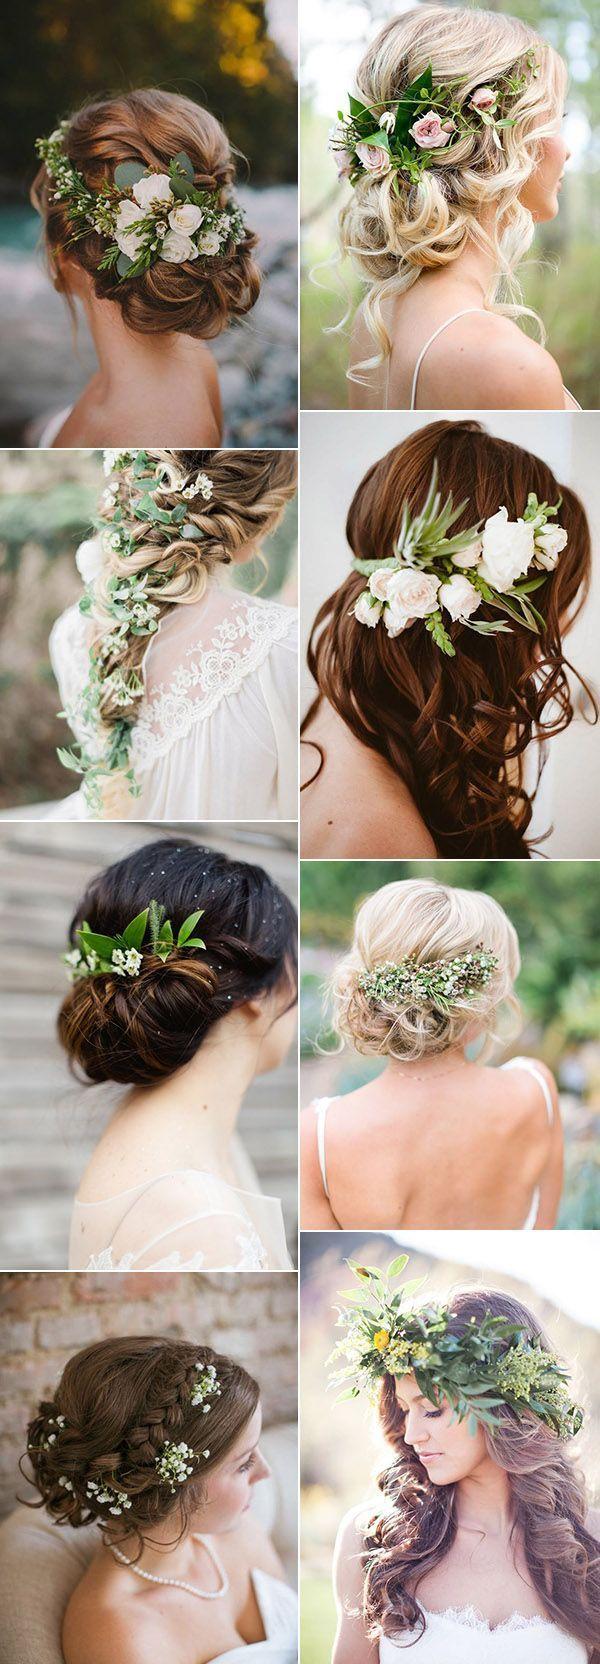 Bohemian Wedding Ideas – DIY Boho Chic Wedding, #Bohemian #Boho #Chic #Diy #diyhairstylessho…